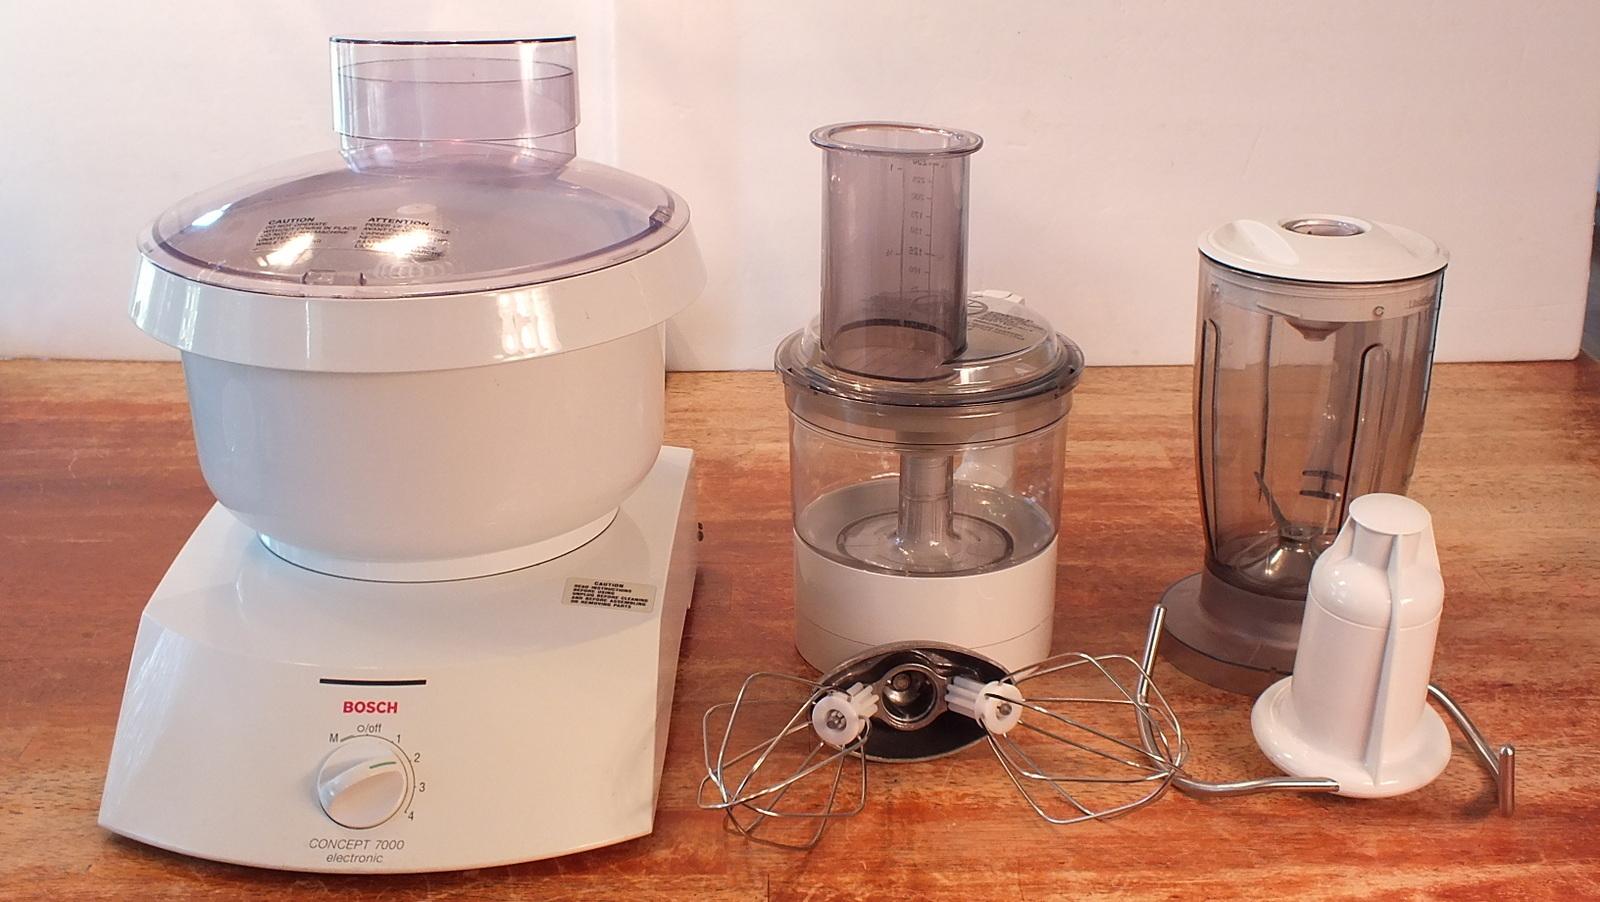 bosch concept 7000 kitchen mixer mum 7150uc 700w four. Black Bedroom Furniture Sets. Home Design Ideas